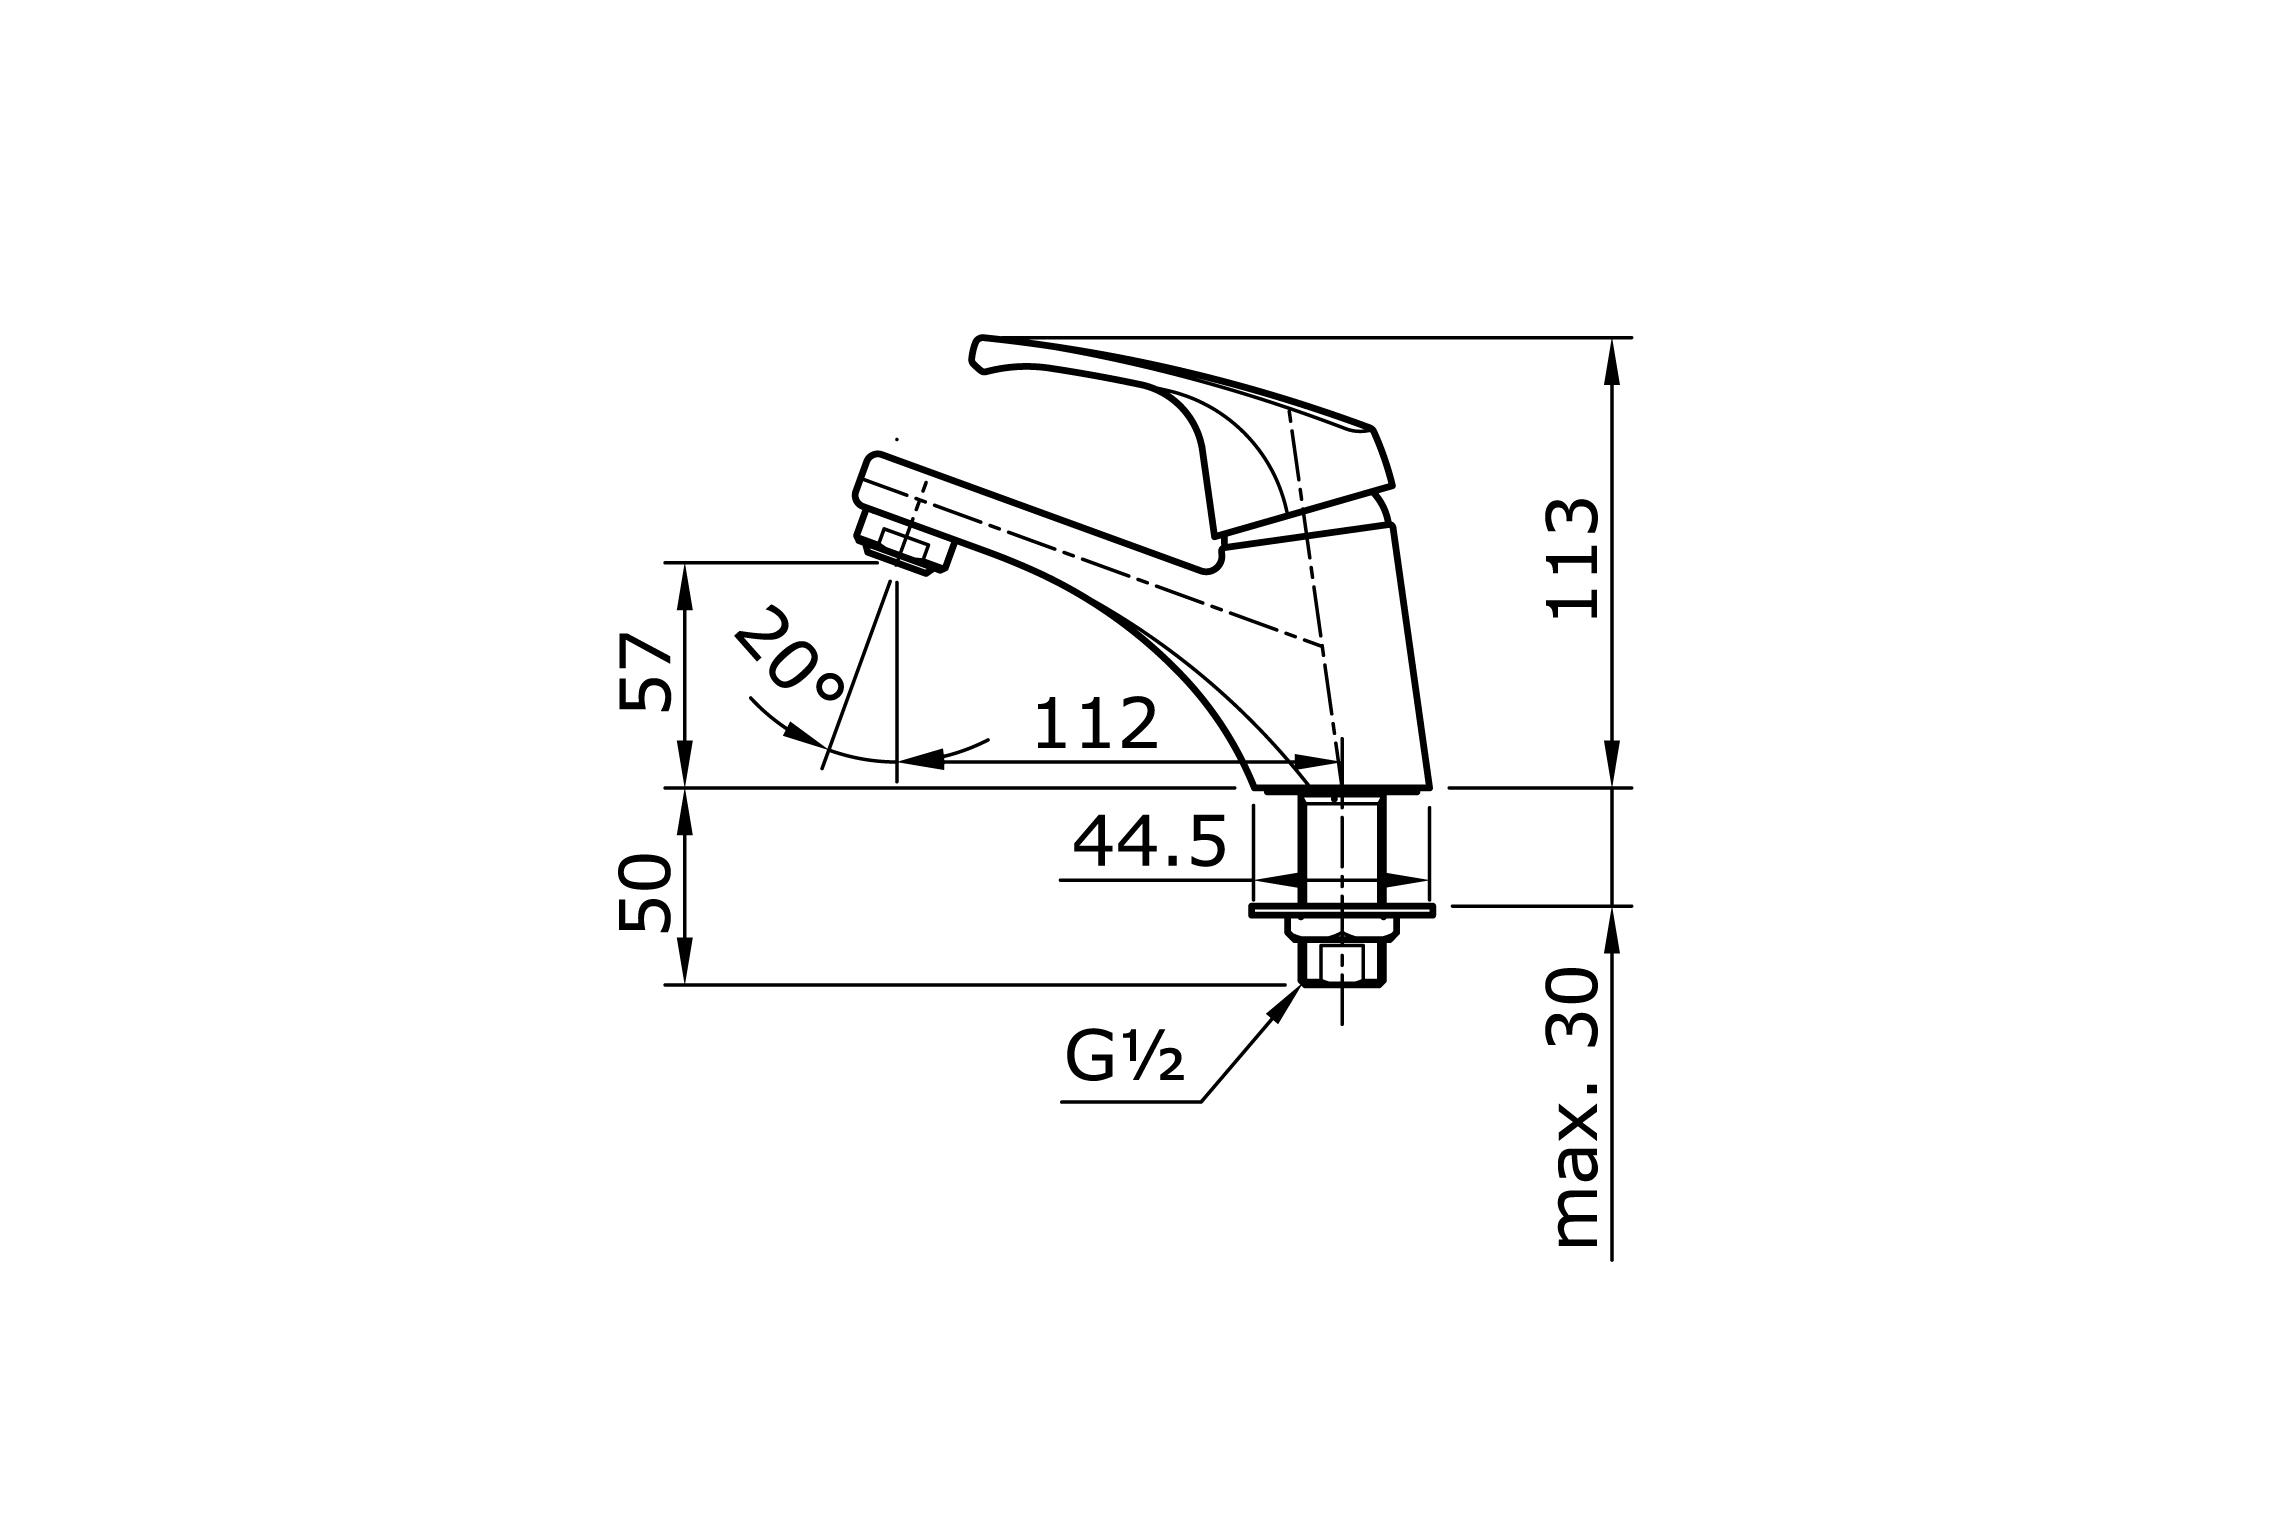 Toto Tx109ld Daftar Harga Terlengkap Indonesia Terkini Tx116len Extended Single Lever Lavatory Faucet Keran Wastafel